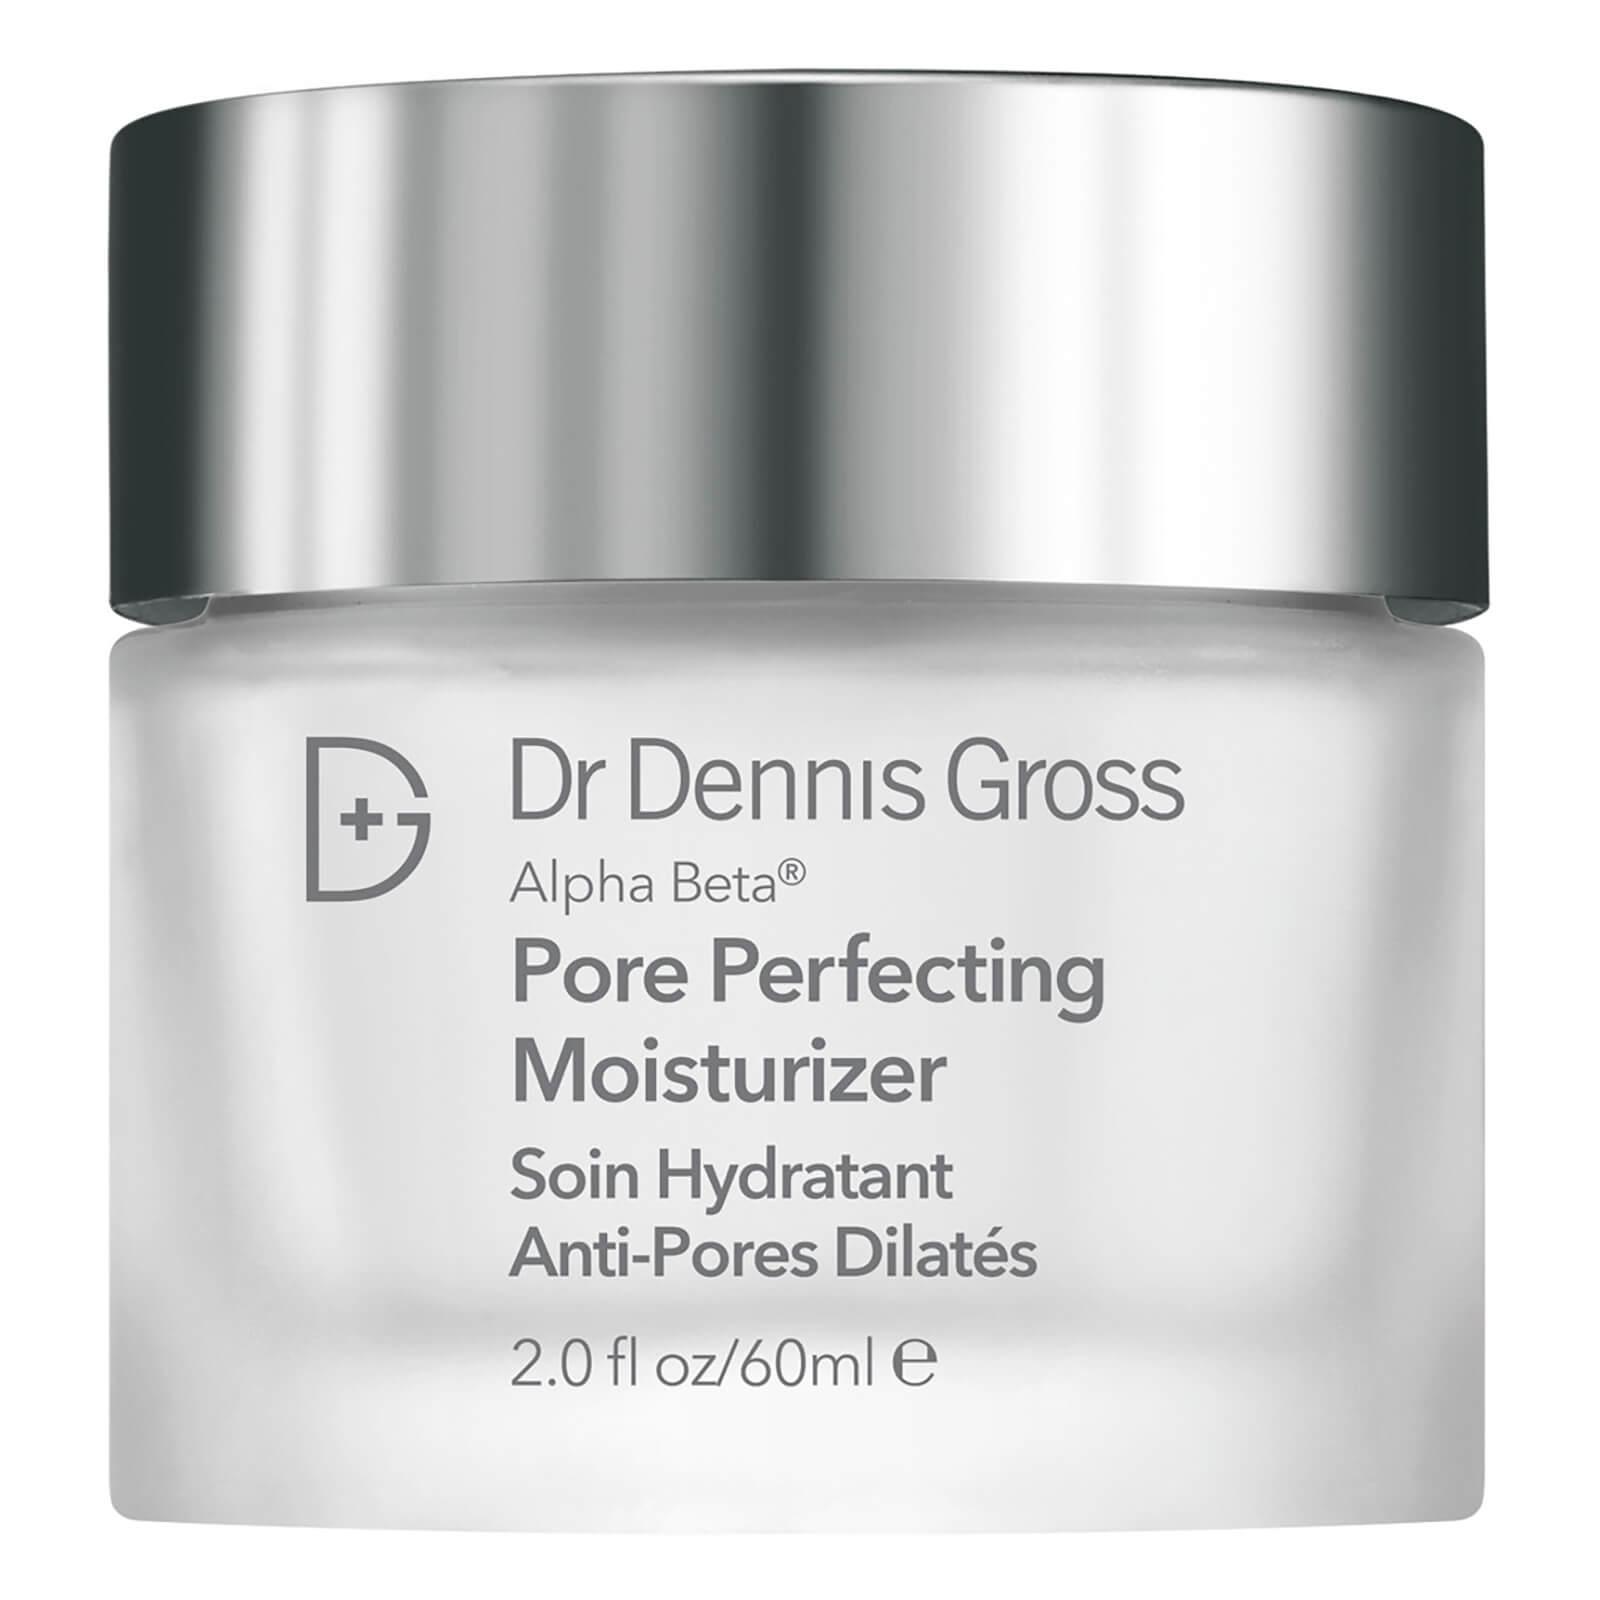 Купить Dr Dennis Gross Skincare Alpha Beta Pore Perfecting Moisturizer 60ml